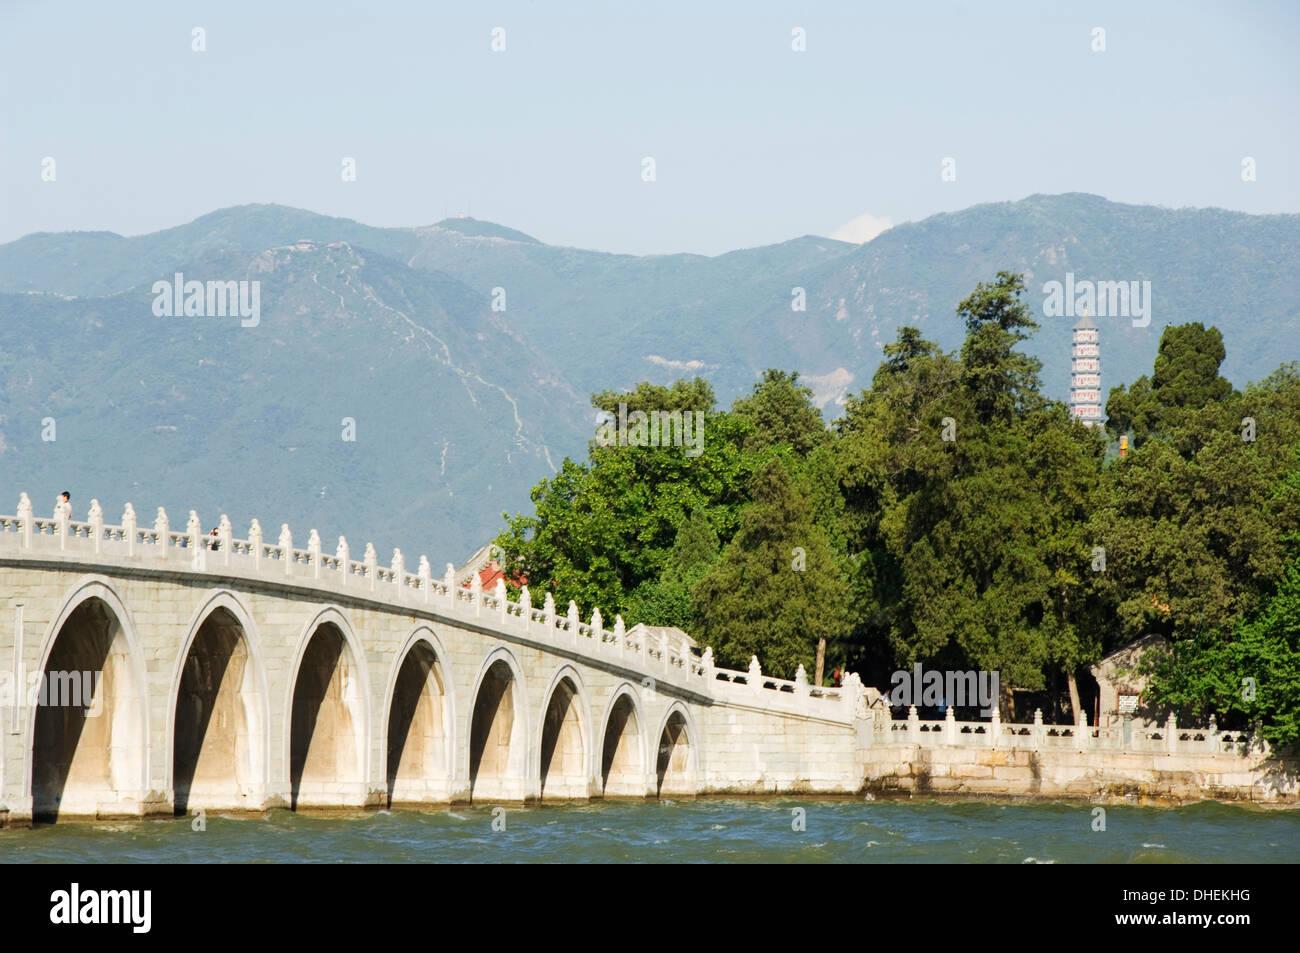 Seventeen Arch Bridge on Kunming Lake, leads to South Lake Island, Yihe Yuan (The Summer Palace), UNESCO, Beijing, China - Stock Image